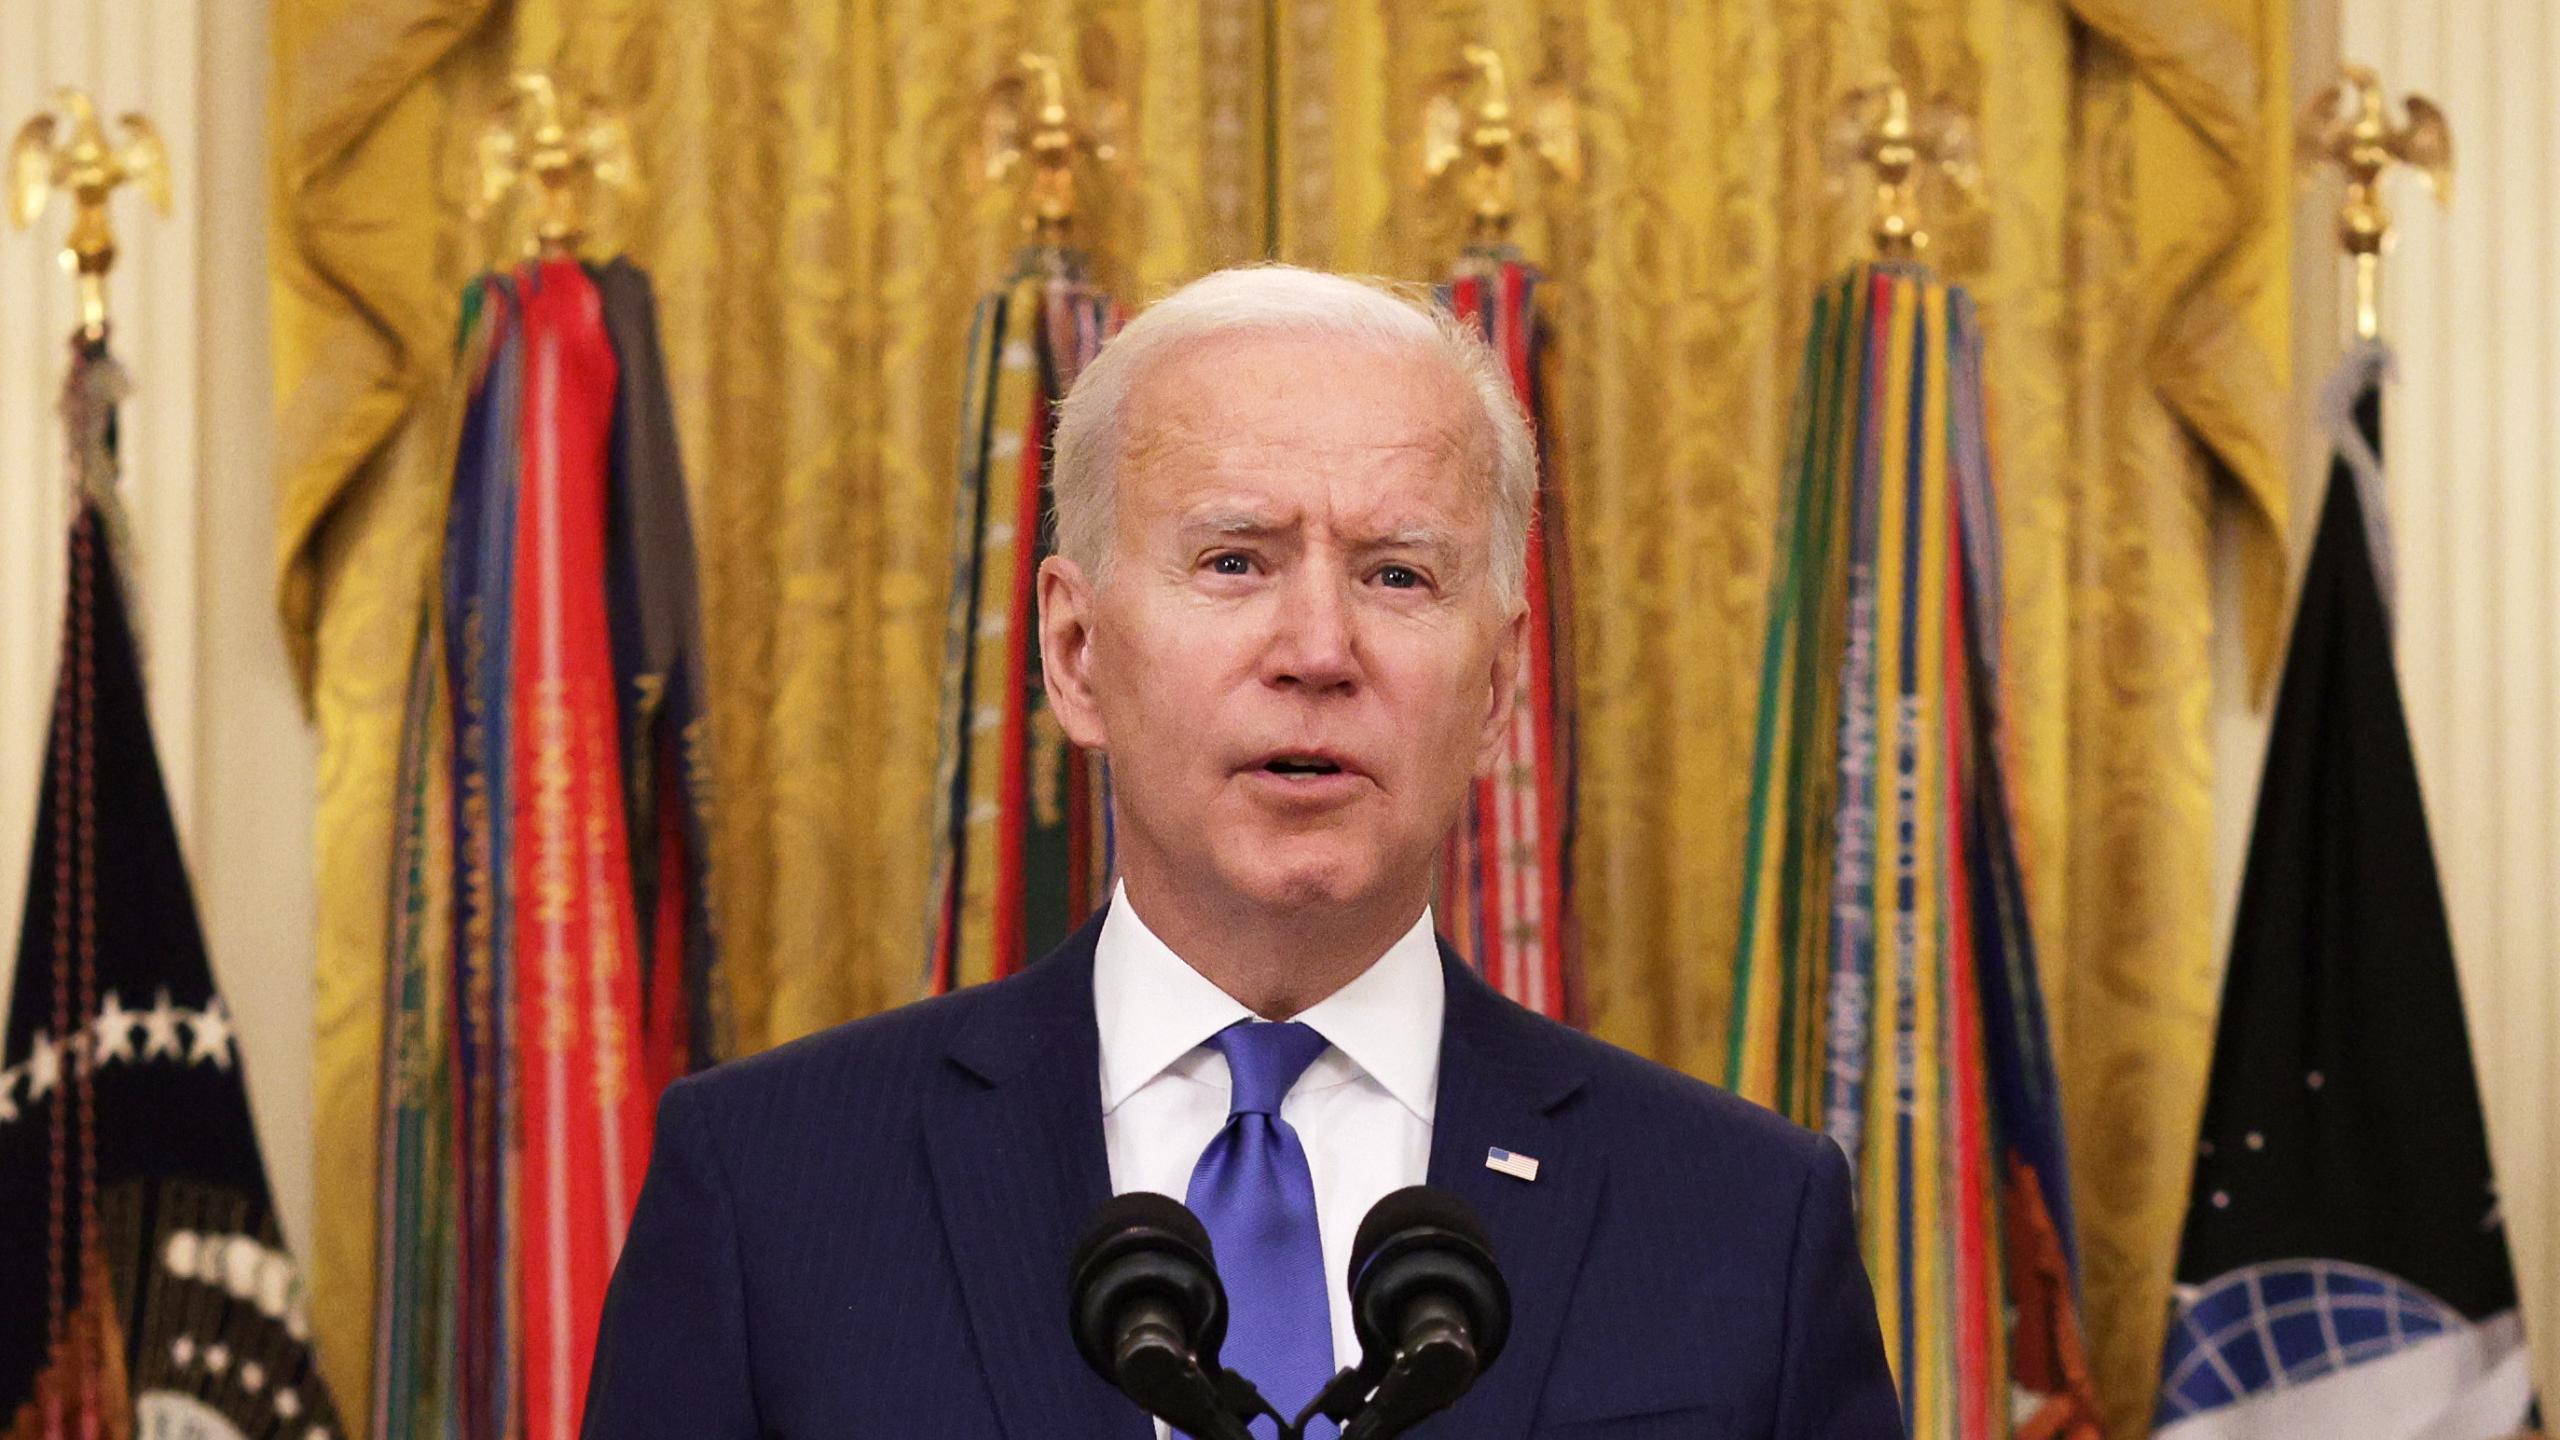 Joe Biden Proposes Tax First Major Federal Tax Hike Since 1993